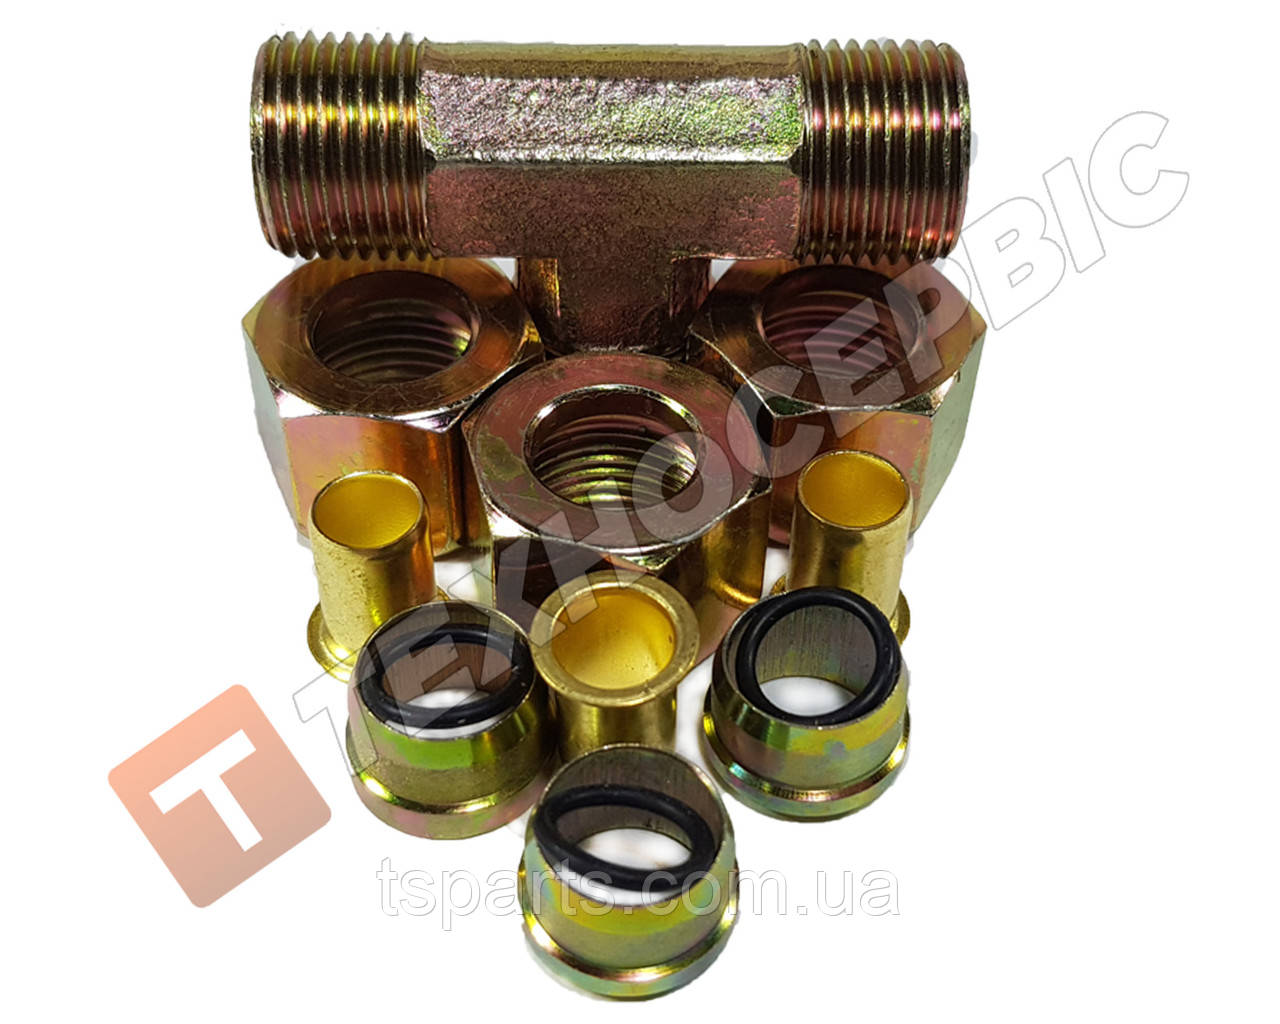 Соединитель тройник тормозной трубки разборной (фурнитура) (фитинг) Ø8мм (13 наименований)